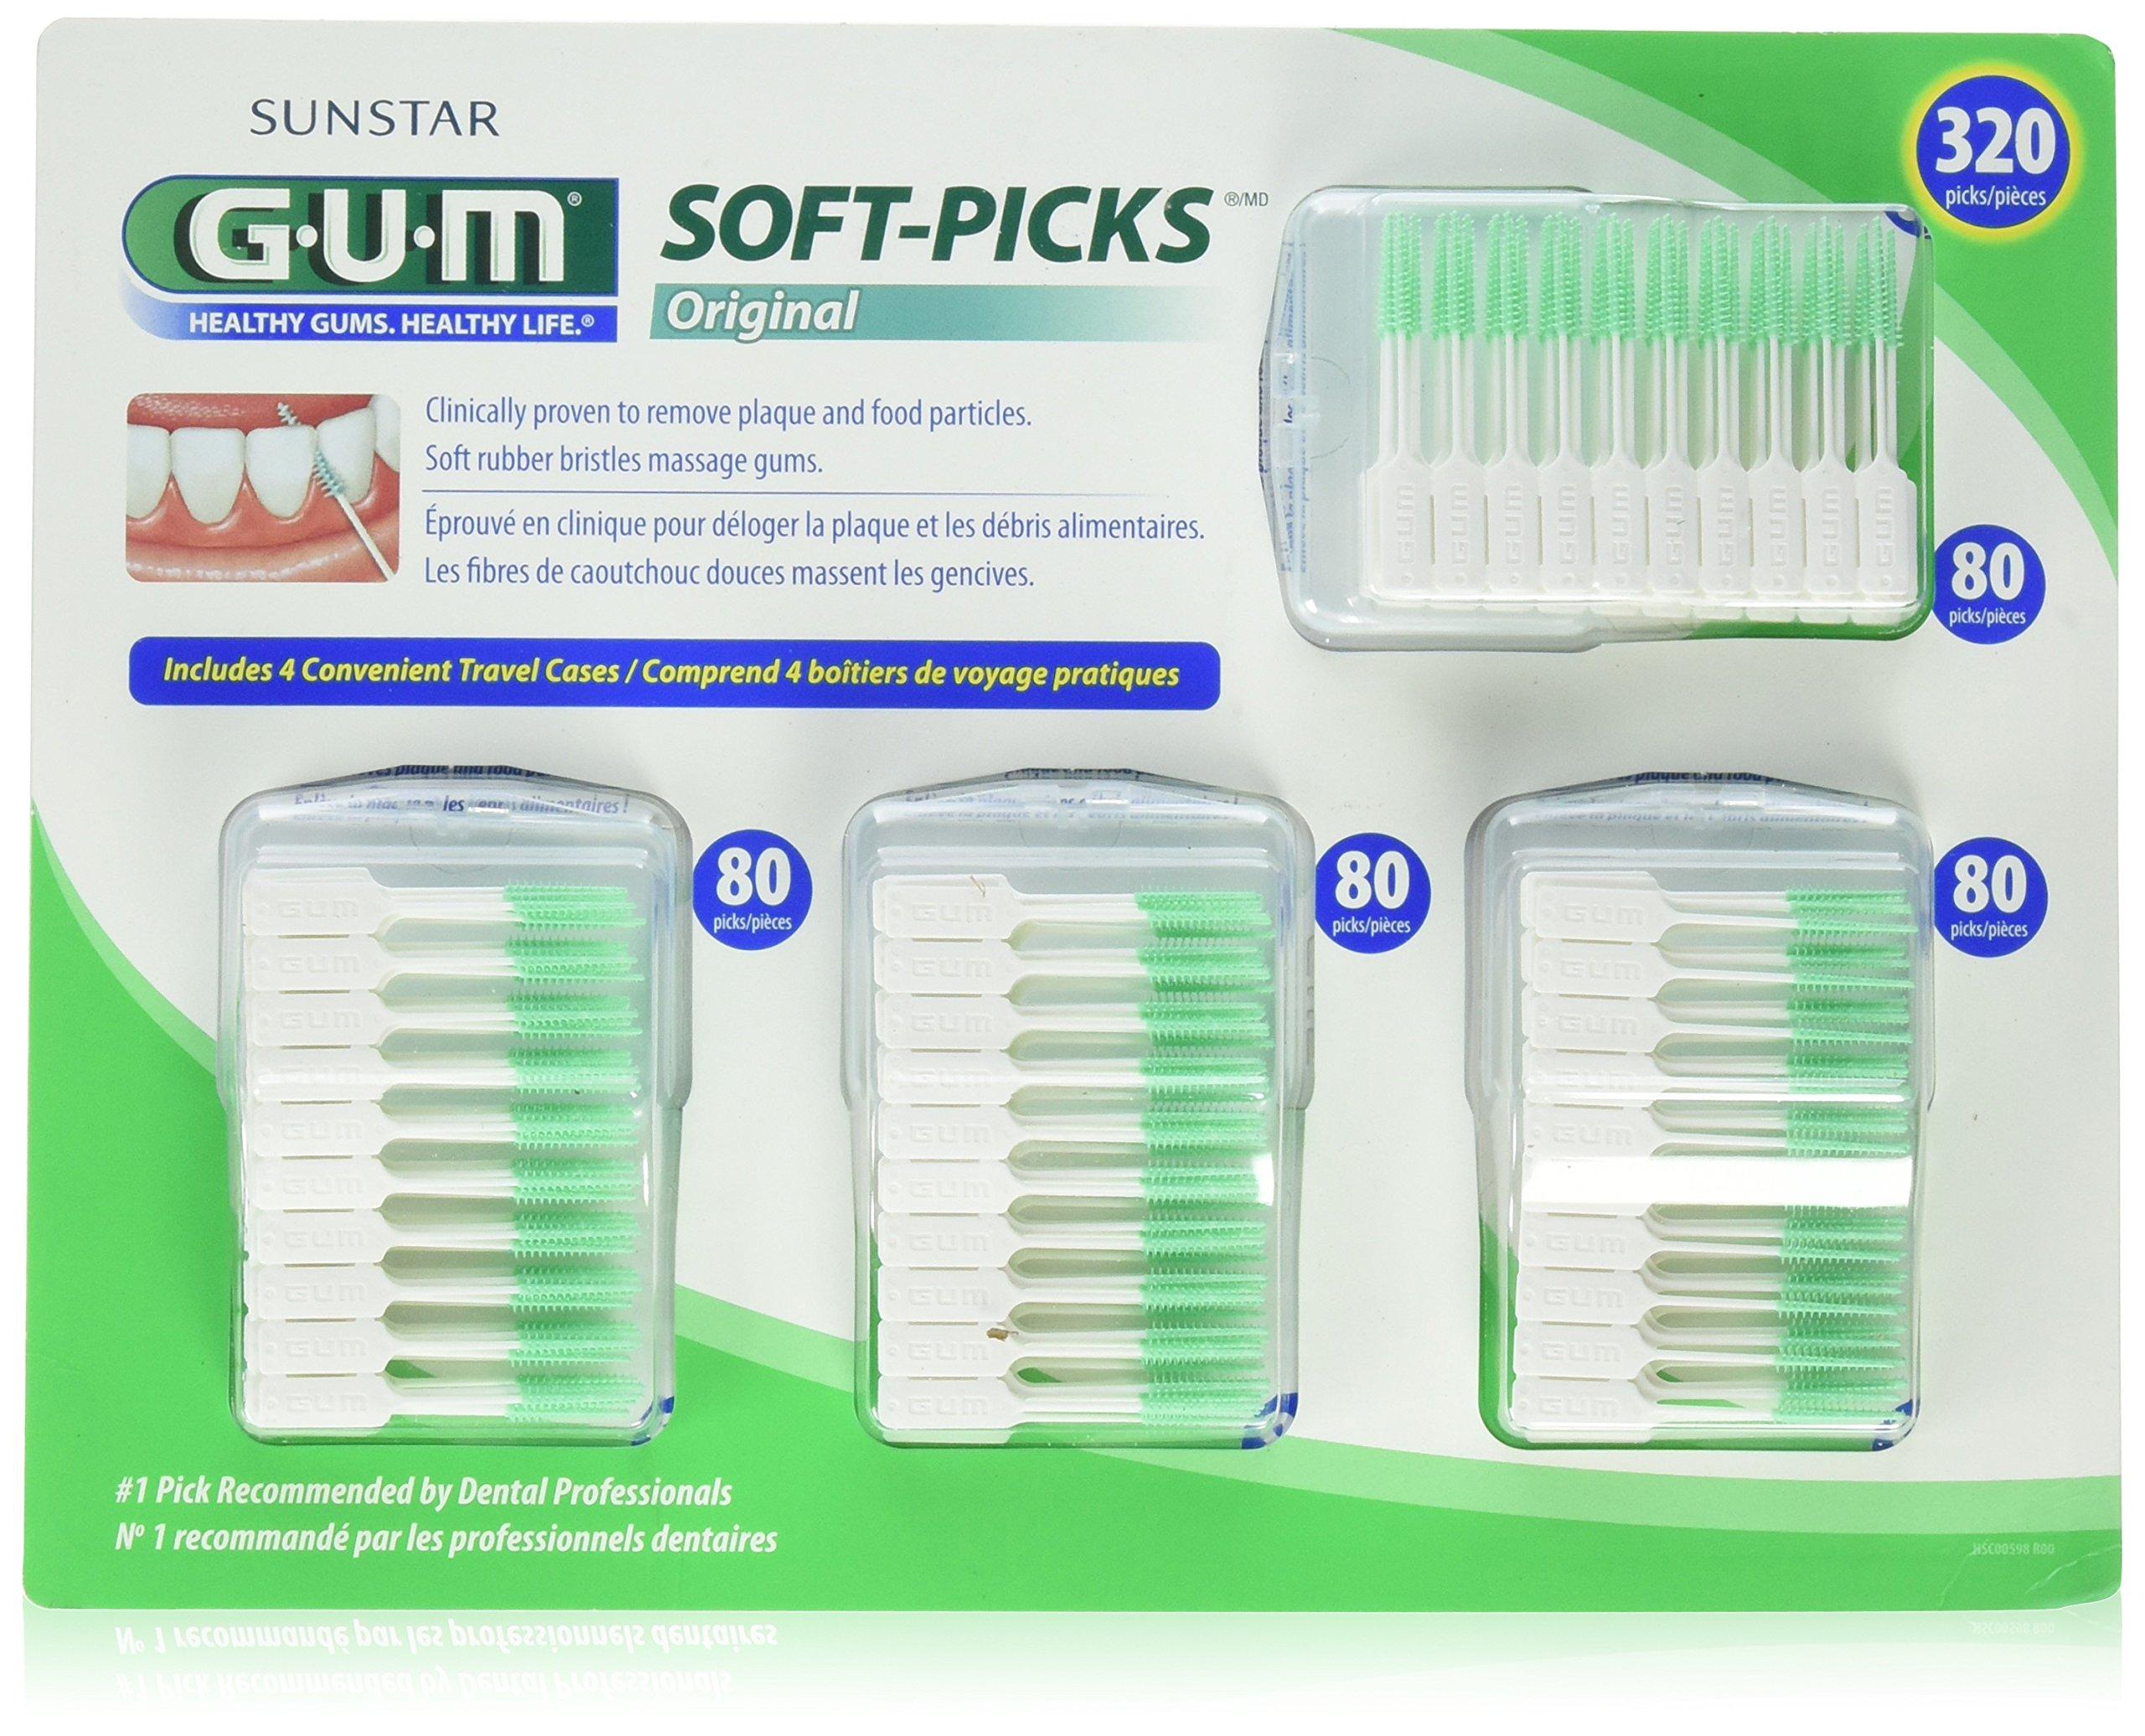 GUM Soft-Picks Original 320 Count